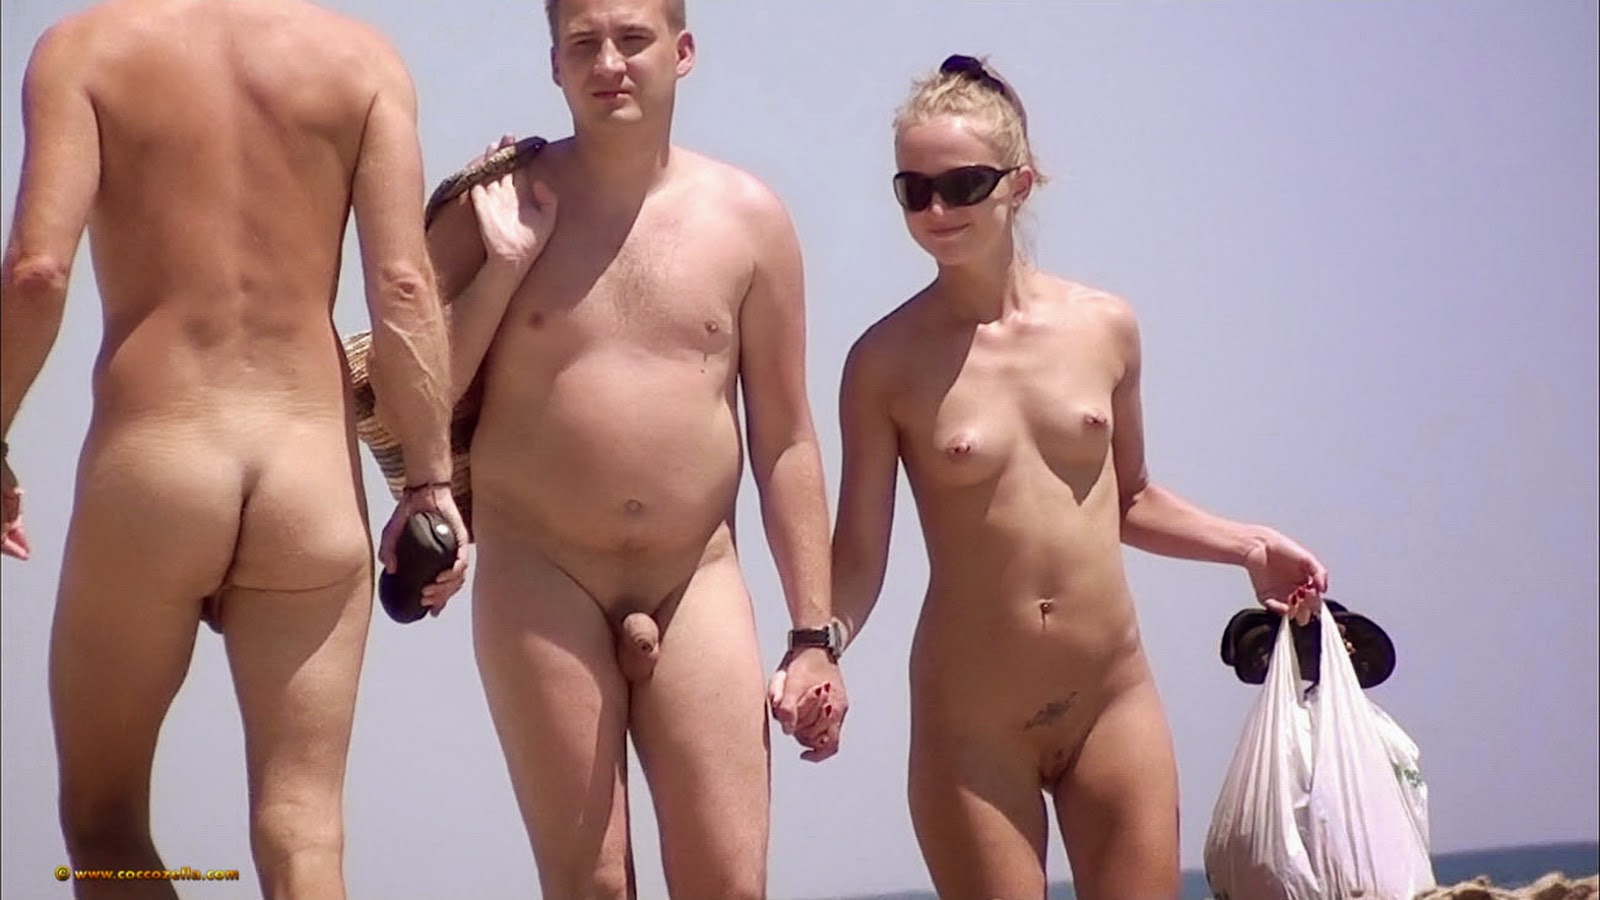 nudistische-familienschlafueberraschung-gujarati-porno-fotos